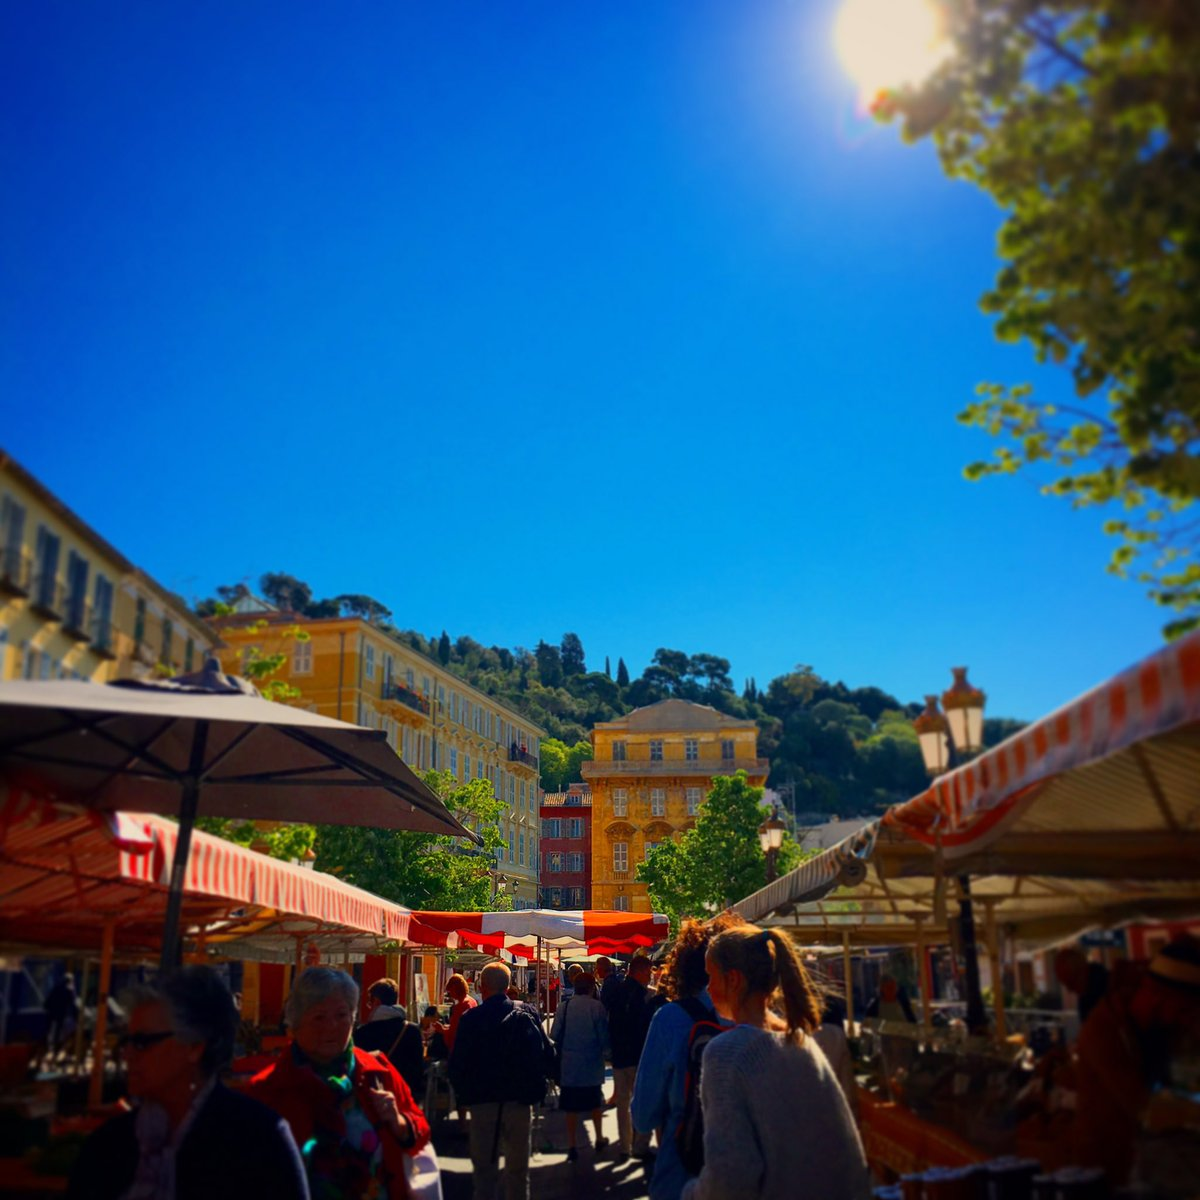 Cours Saleya fresh produce &amp; flower market in Nice, France. #france #nice06 #cotedazur #Cotedazurfrance @Nice_Tourisme @VisitCotedazur #love<br>http://pic.twitter.com/xiWwd9zi81